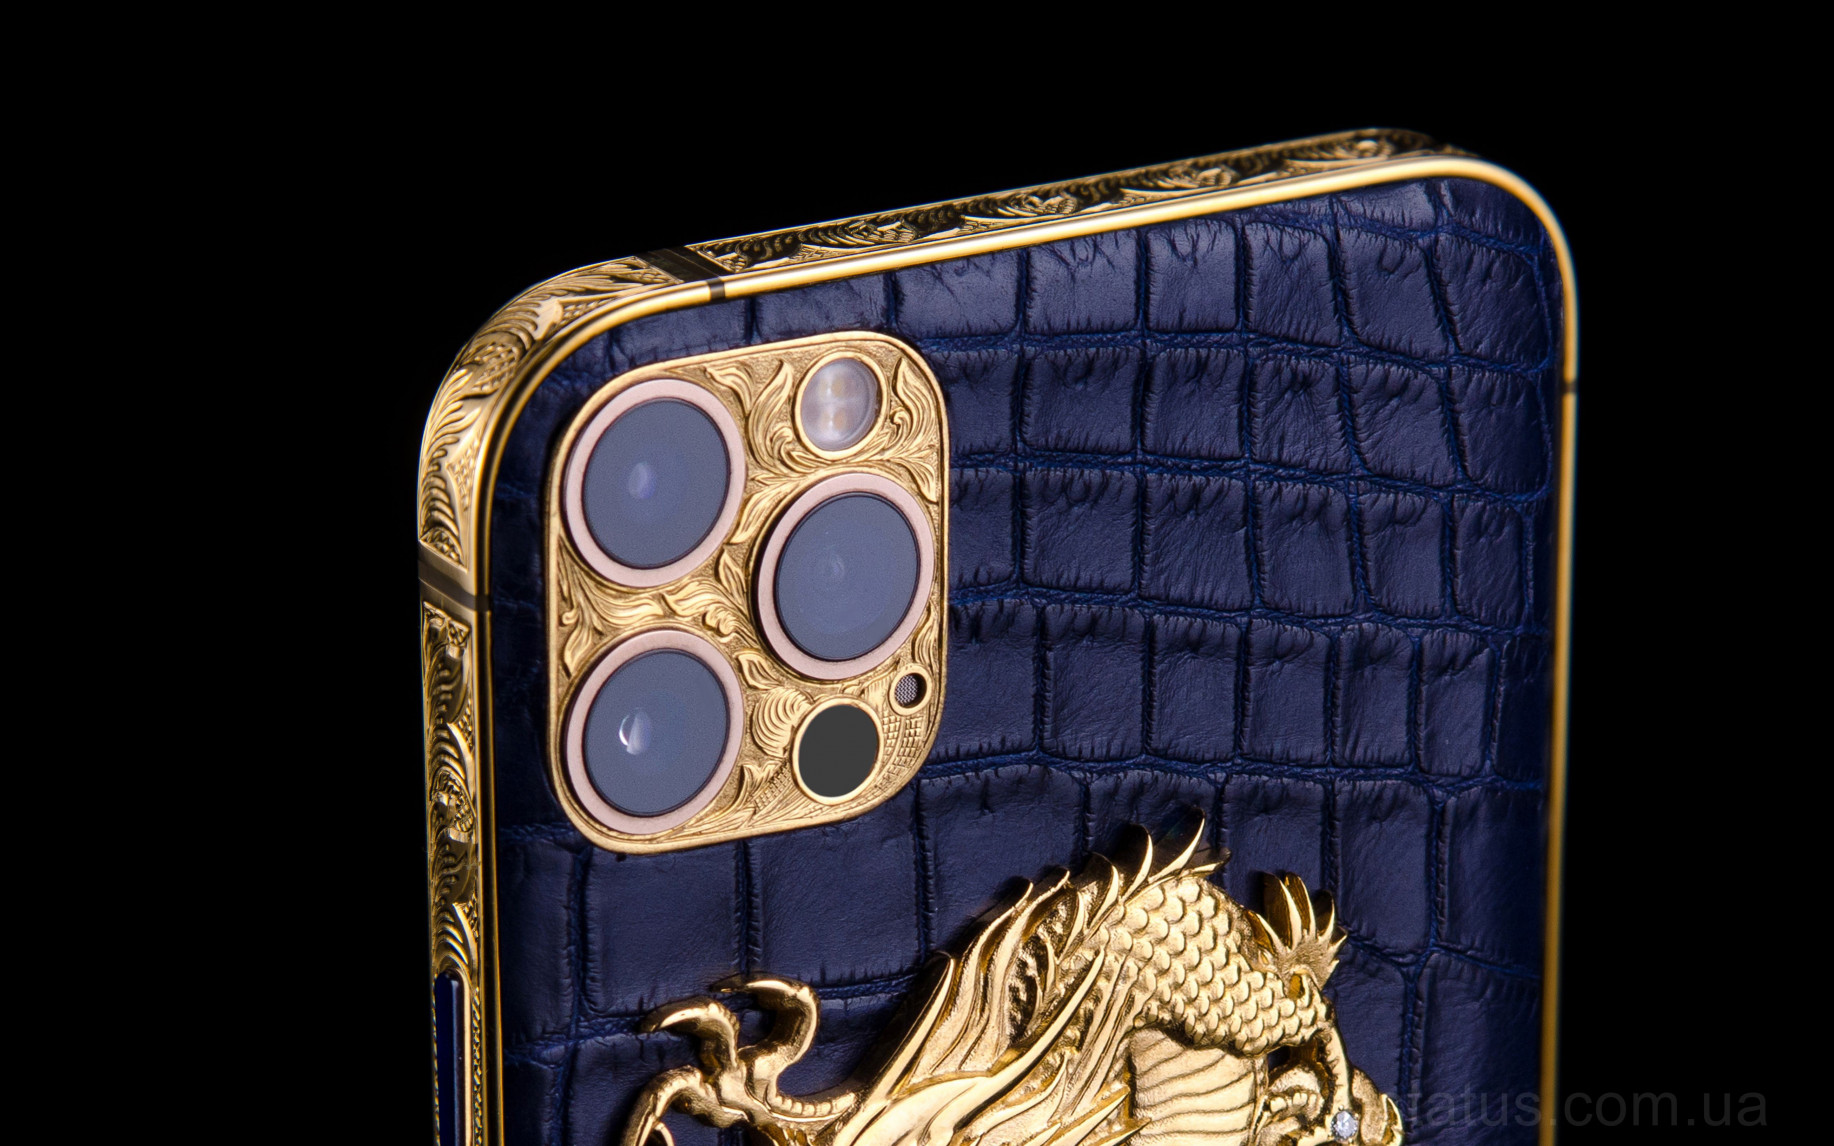 Elite Oriental Dragon IPHONE 12 PRO MAX 512 GB Oriental Dragon IPHONE 12 PRO MAX 512 GB image 6